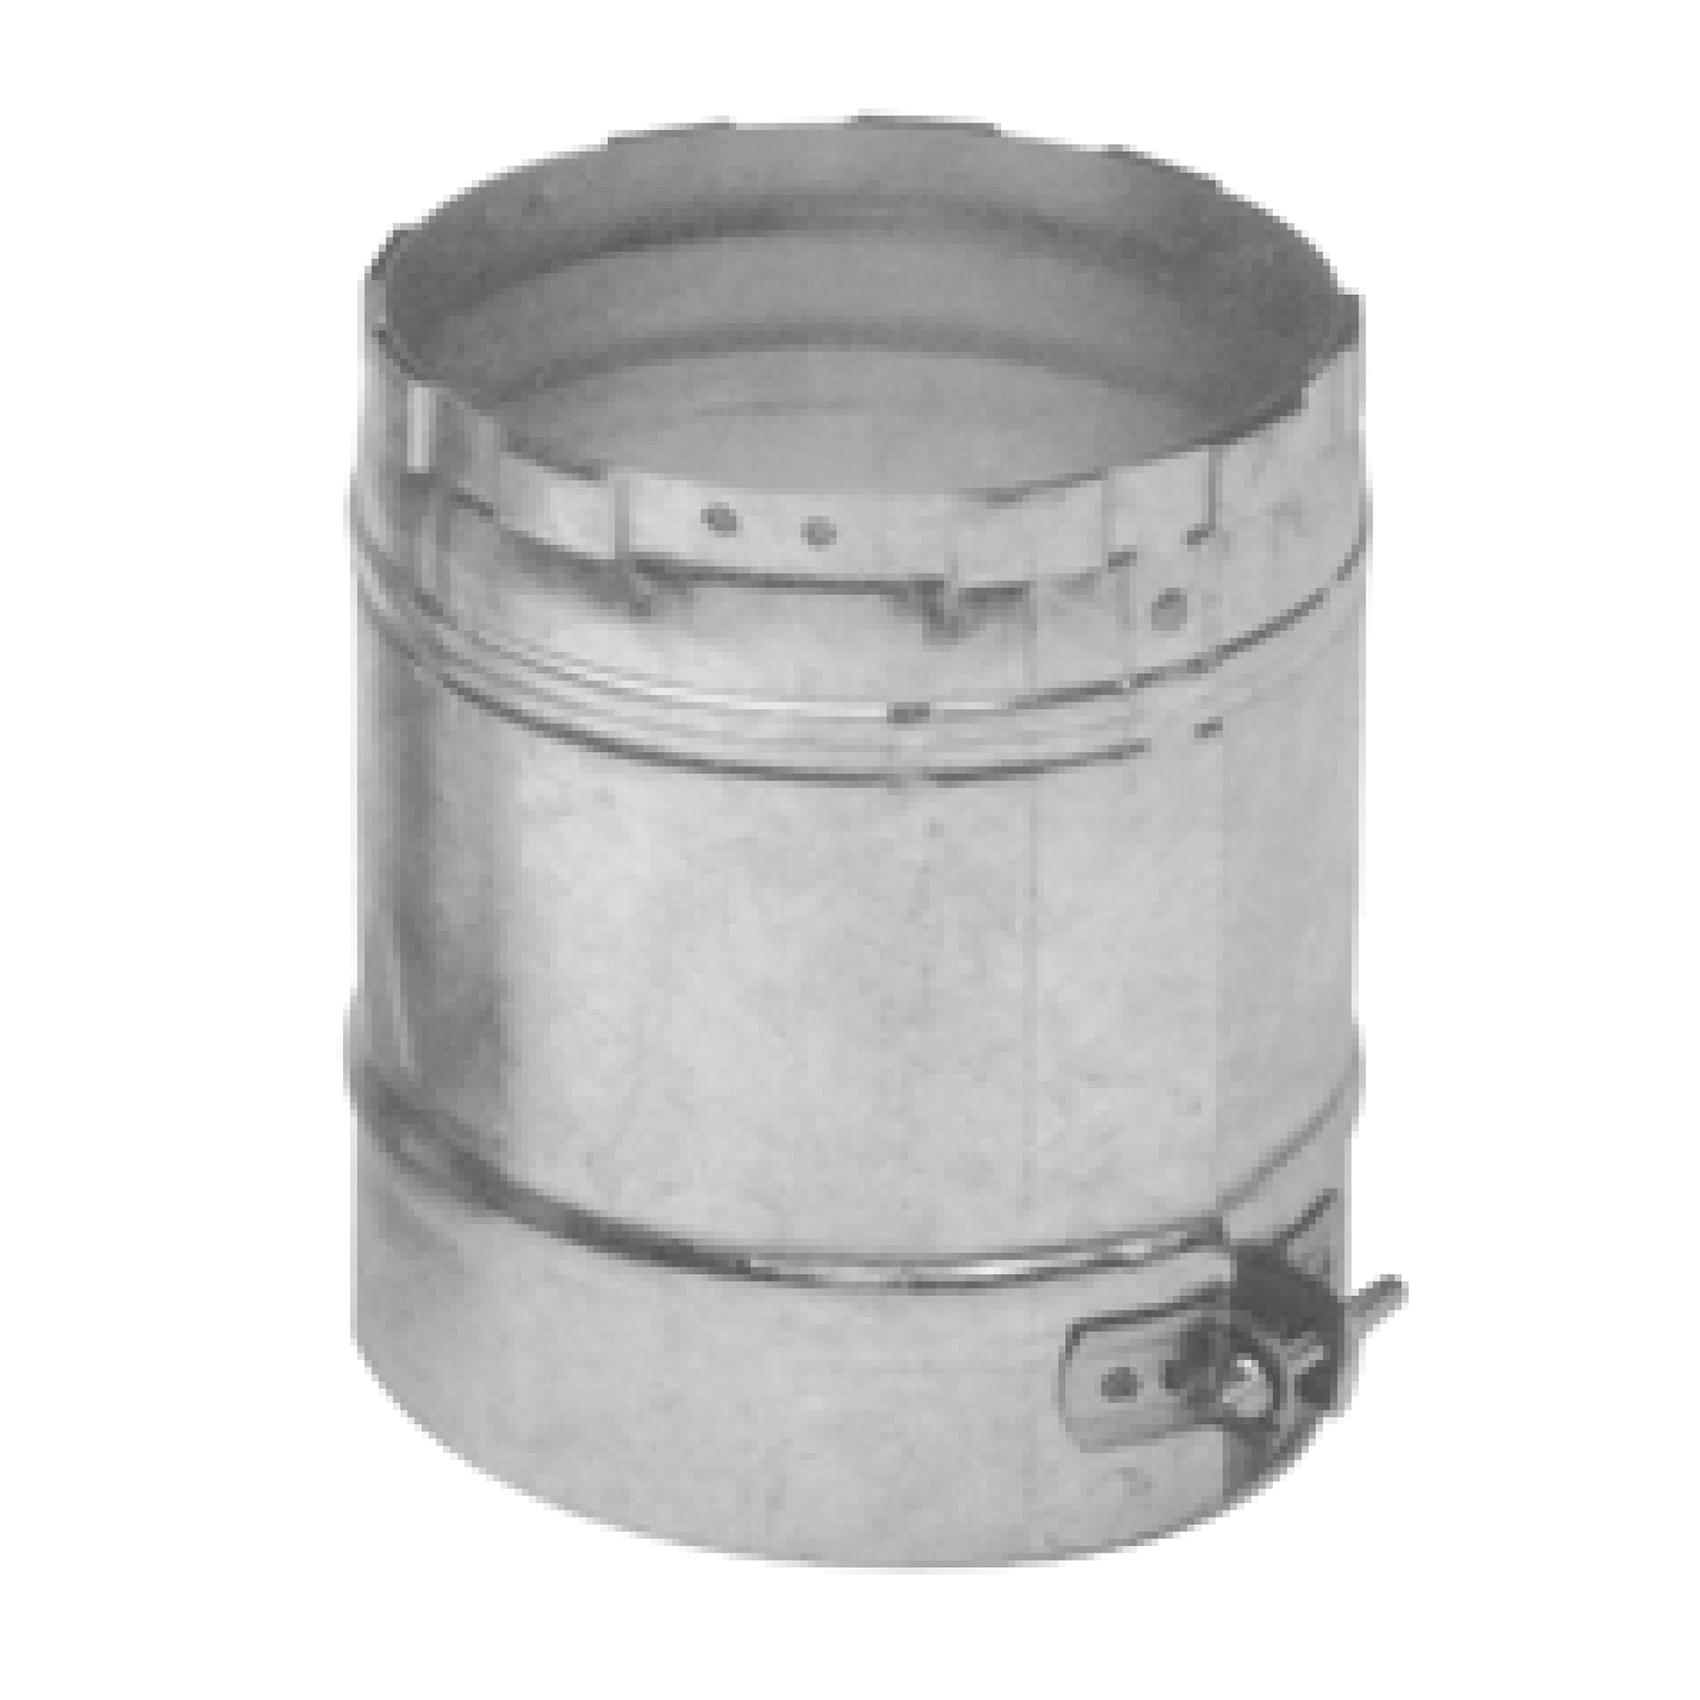 AmeriVent® 4EUA-F Universal Female Adapter, 4 in Dia x 4-1/2 in L, Steel, Galvanized